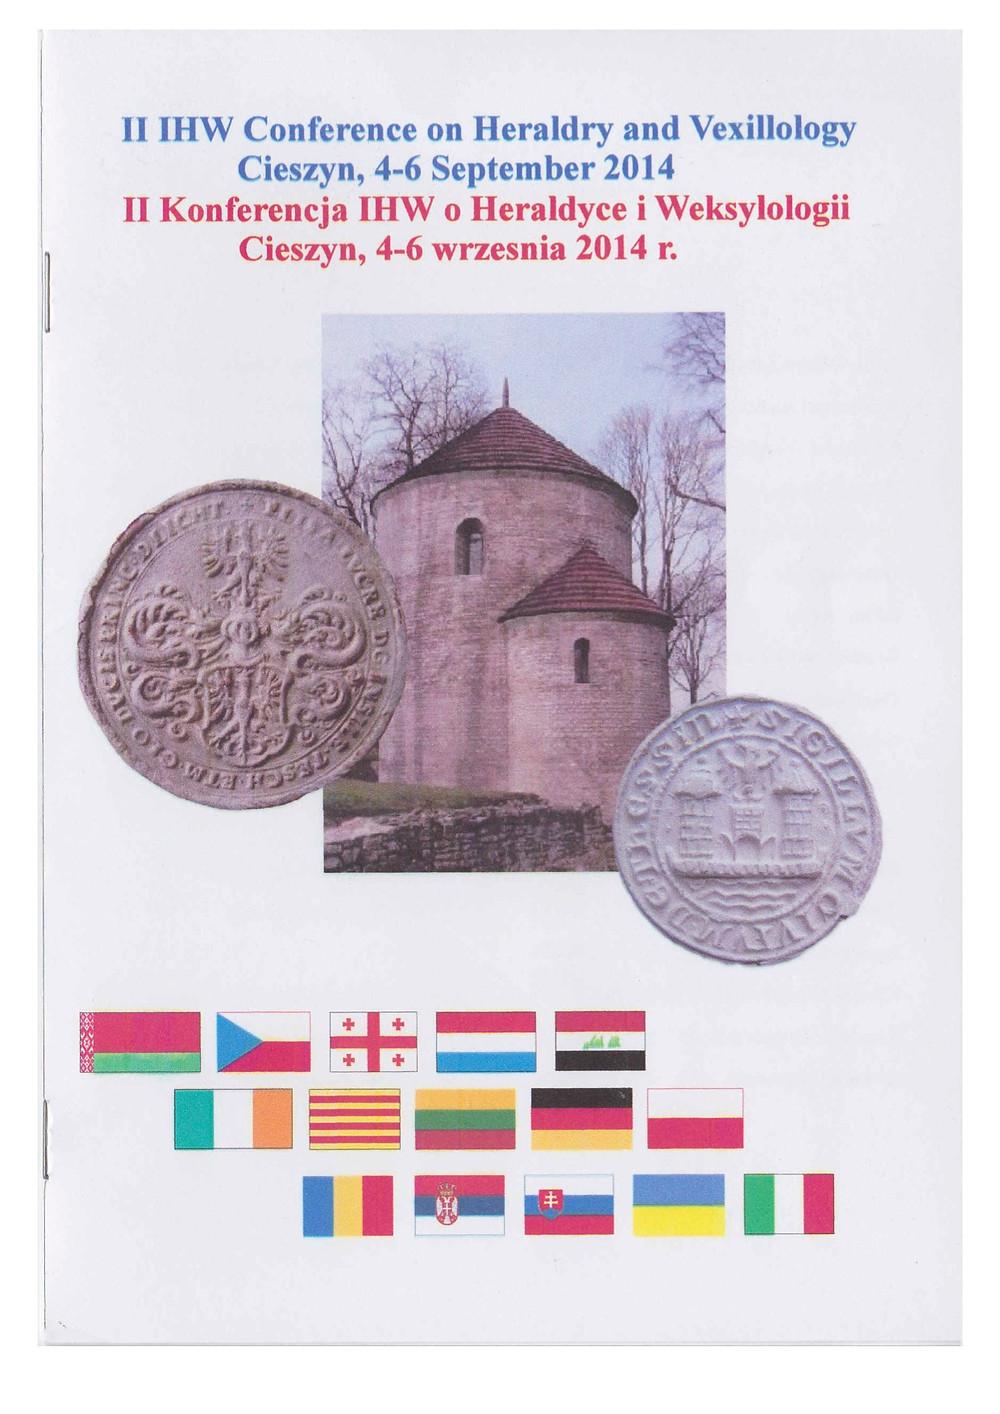 II IHW Polonia Programma.jpg